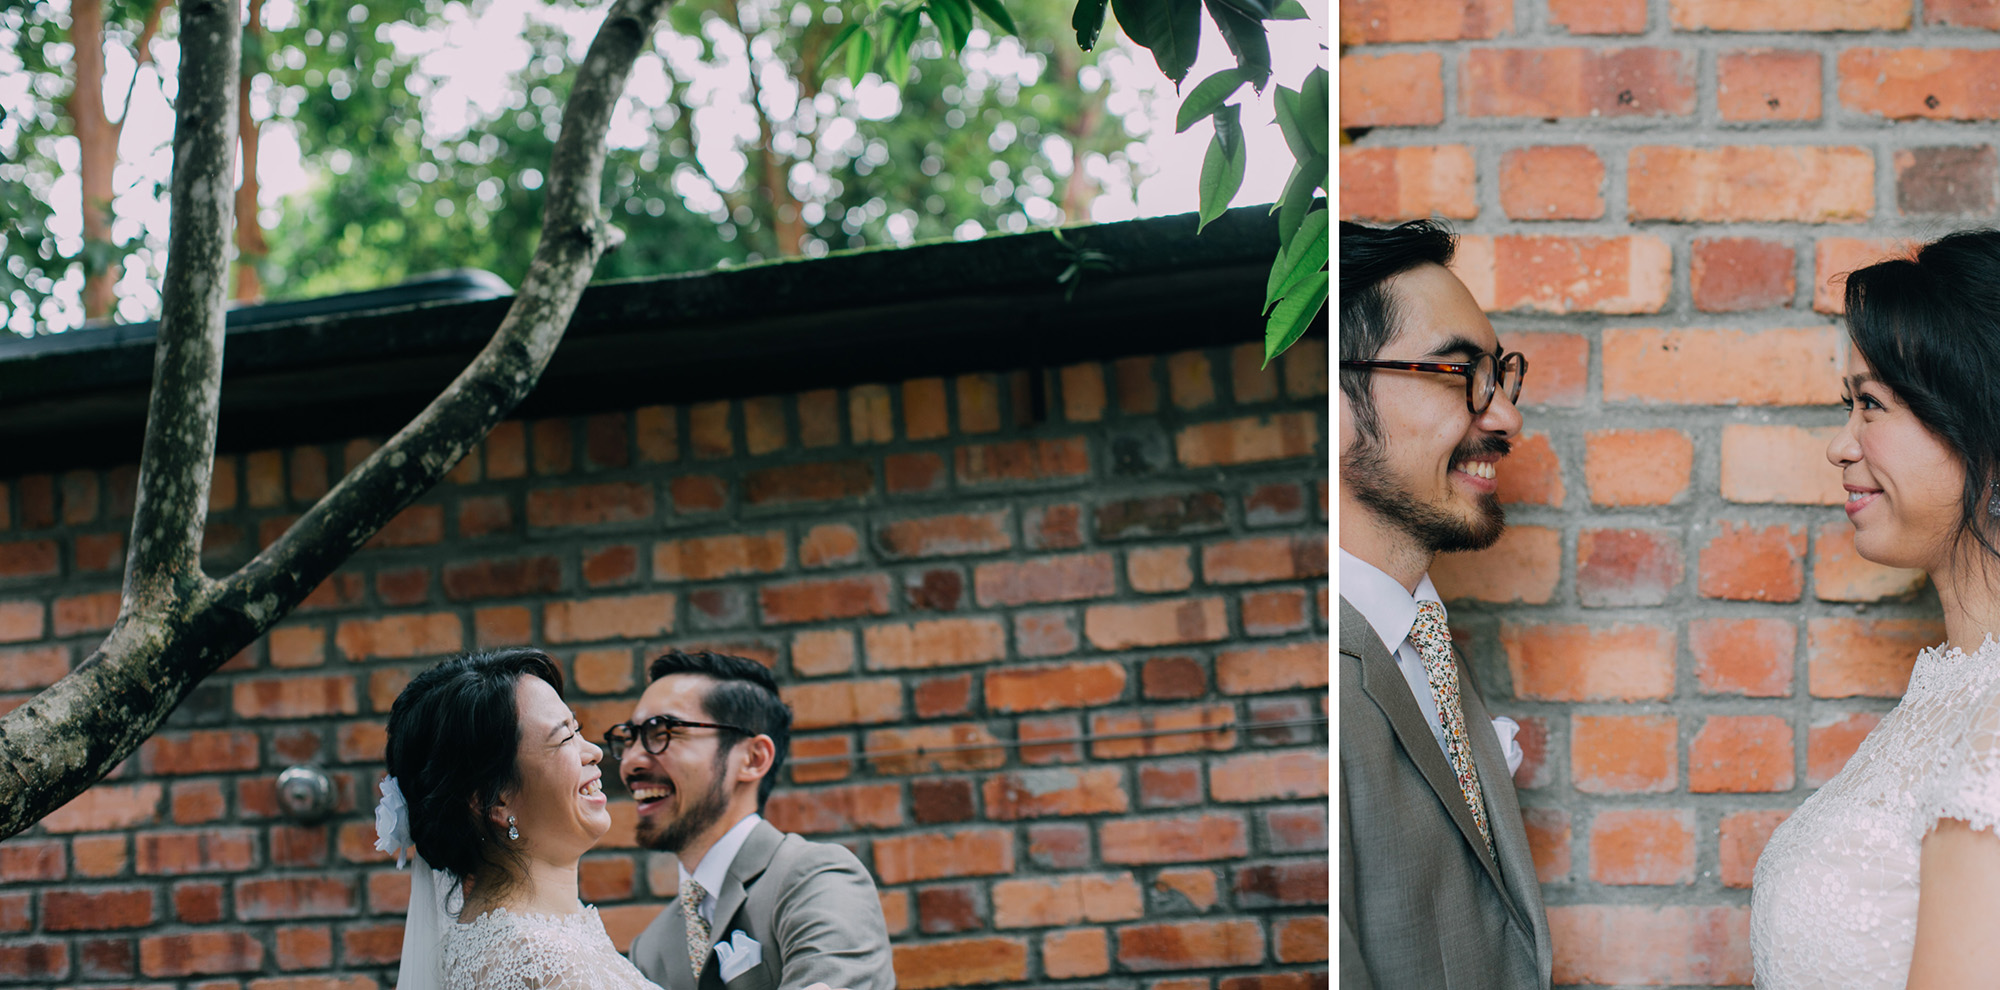 59-hellojanelee-sam grace-malaysia-wedding-day